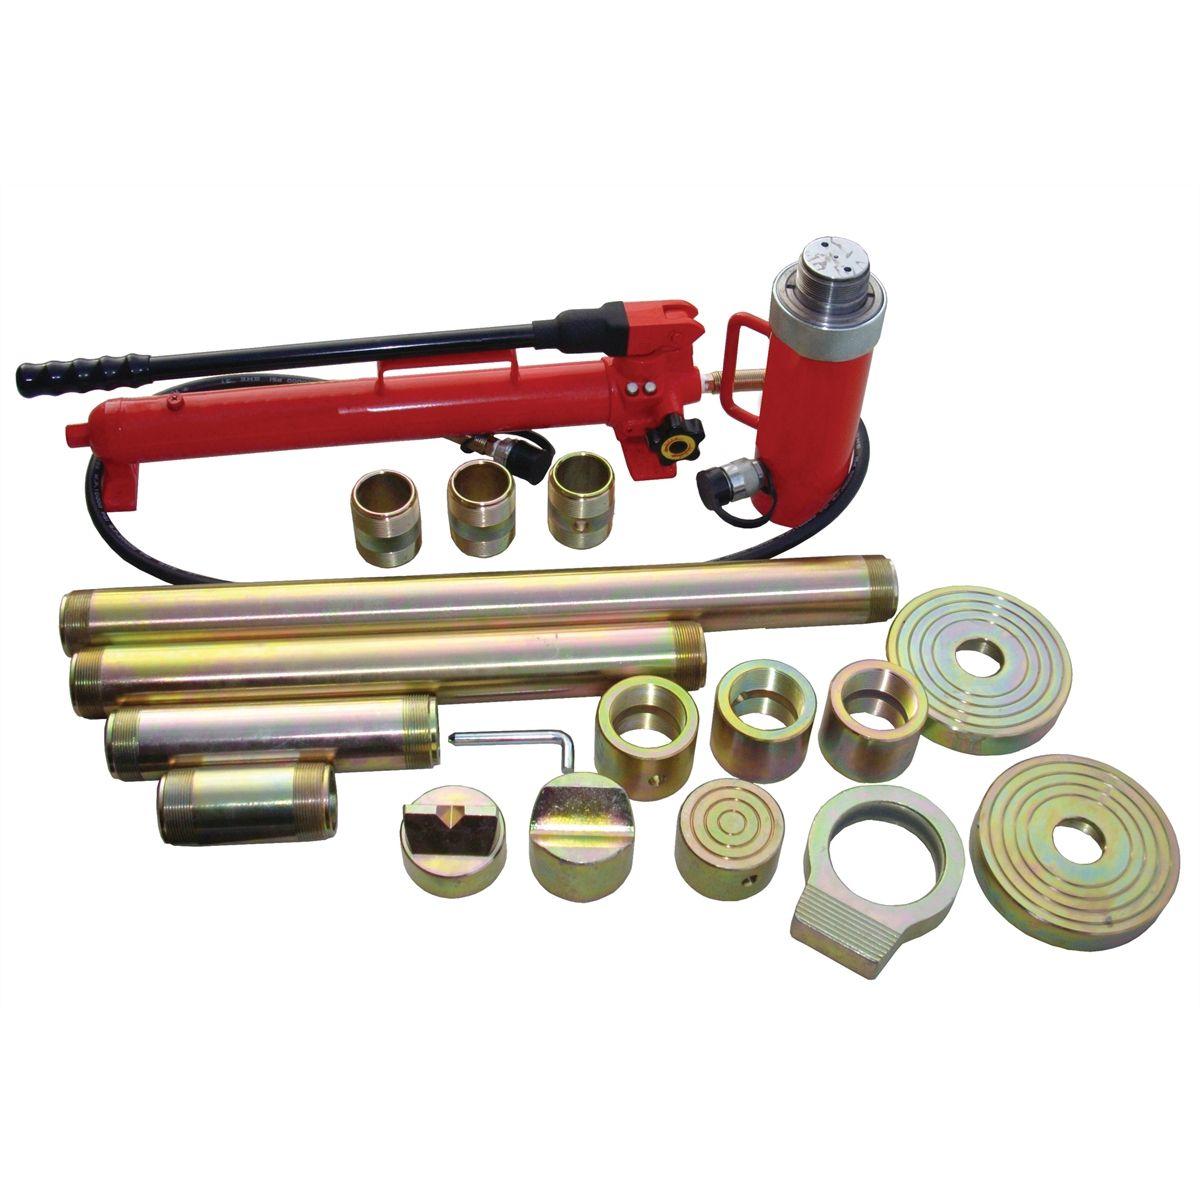 Body & Frame Collision Repair Kit 20 Ton w Metal Case   American ...